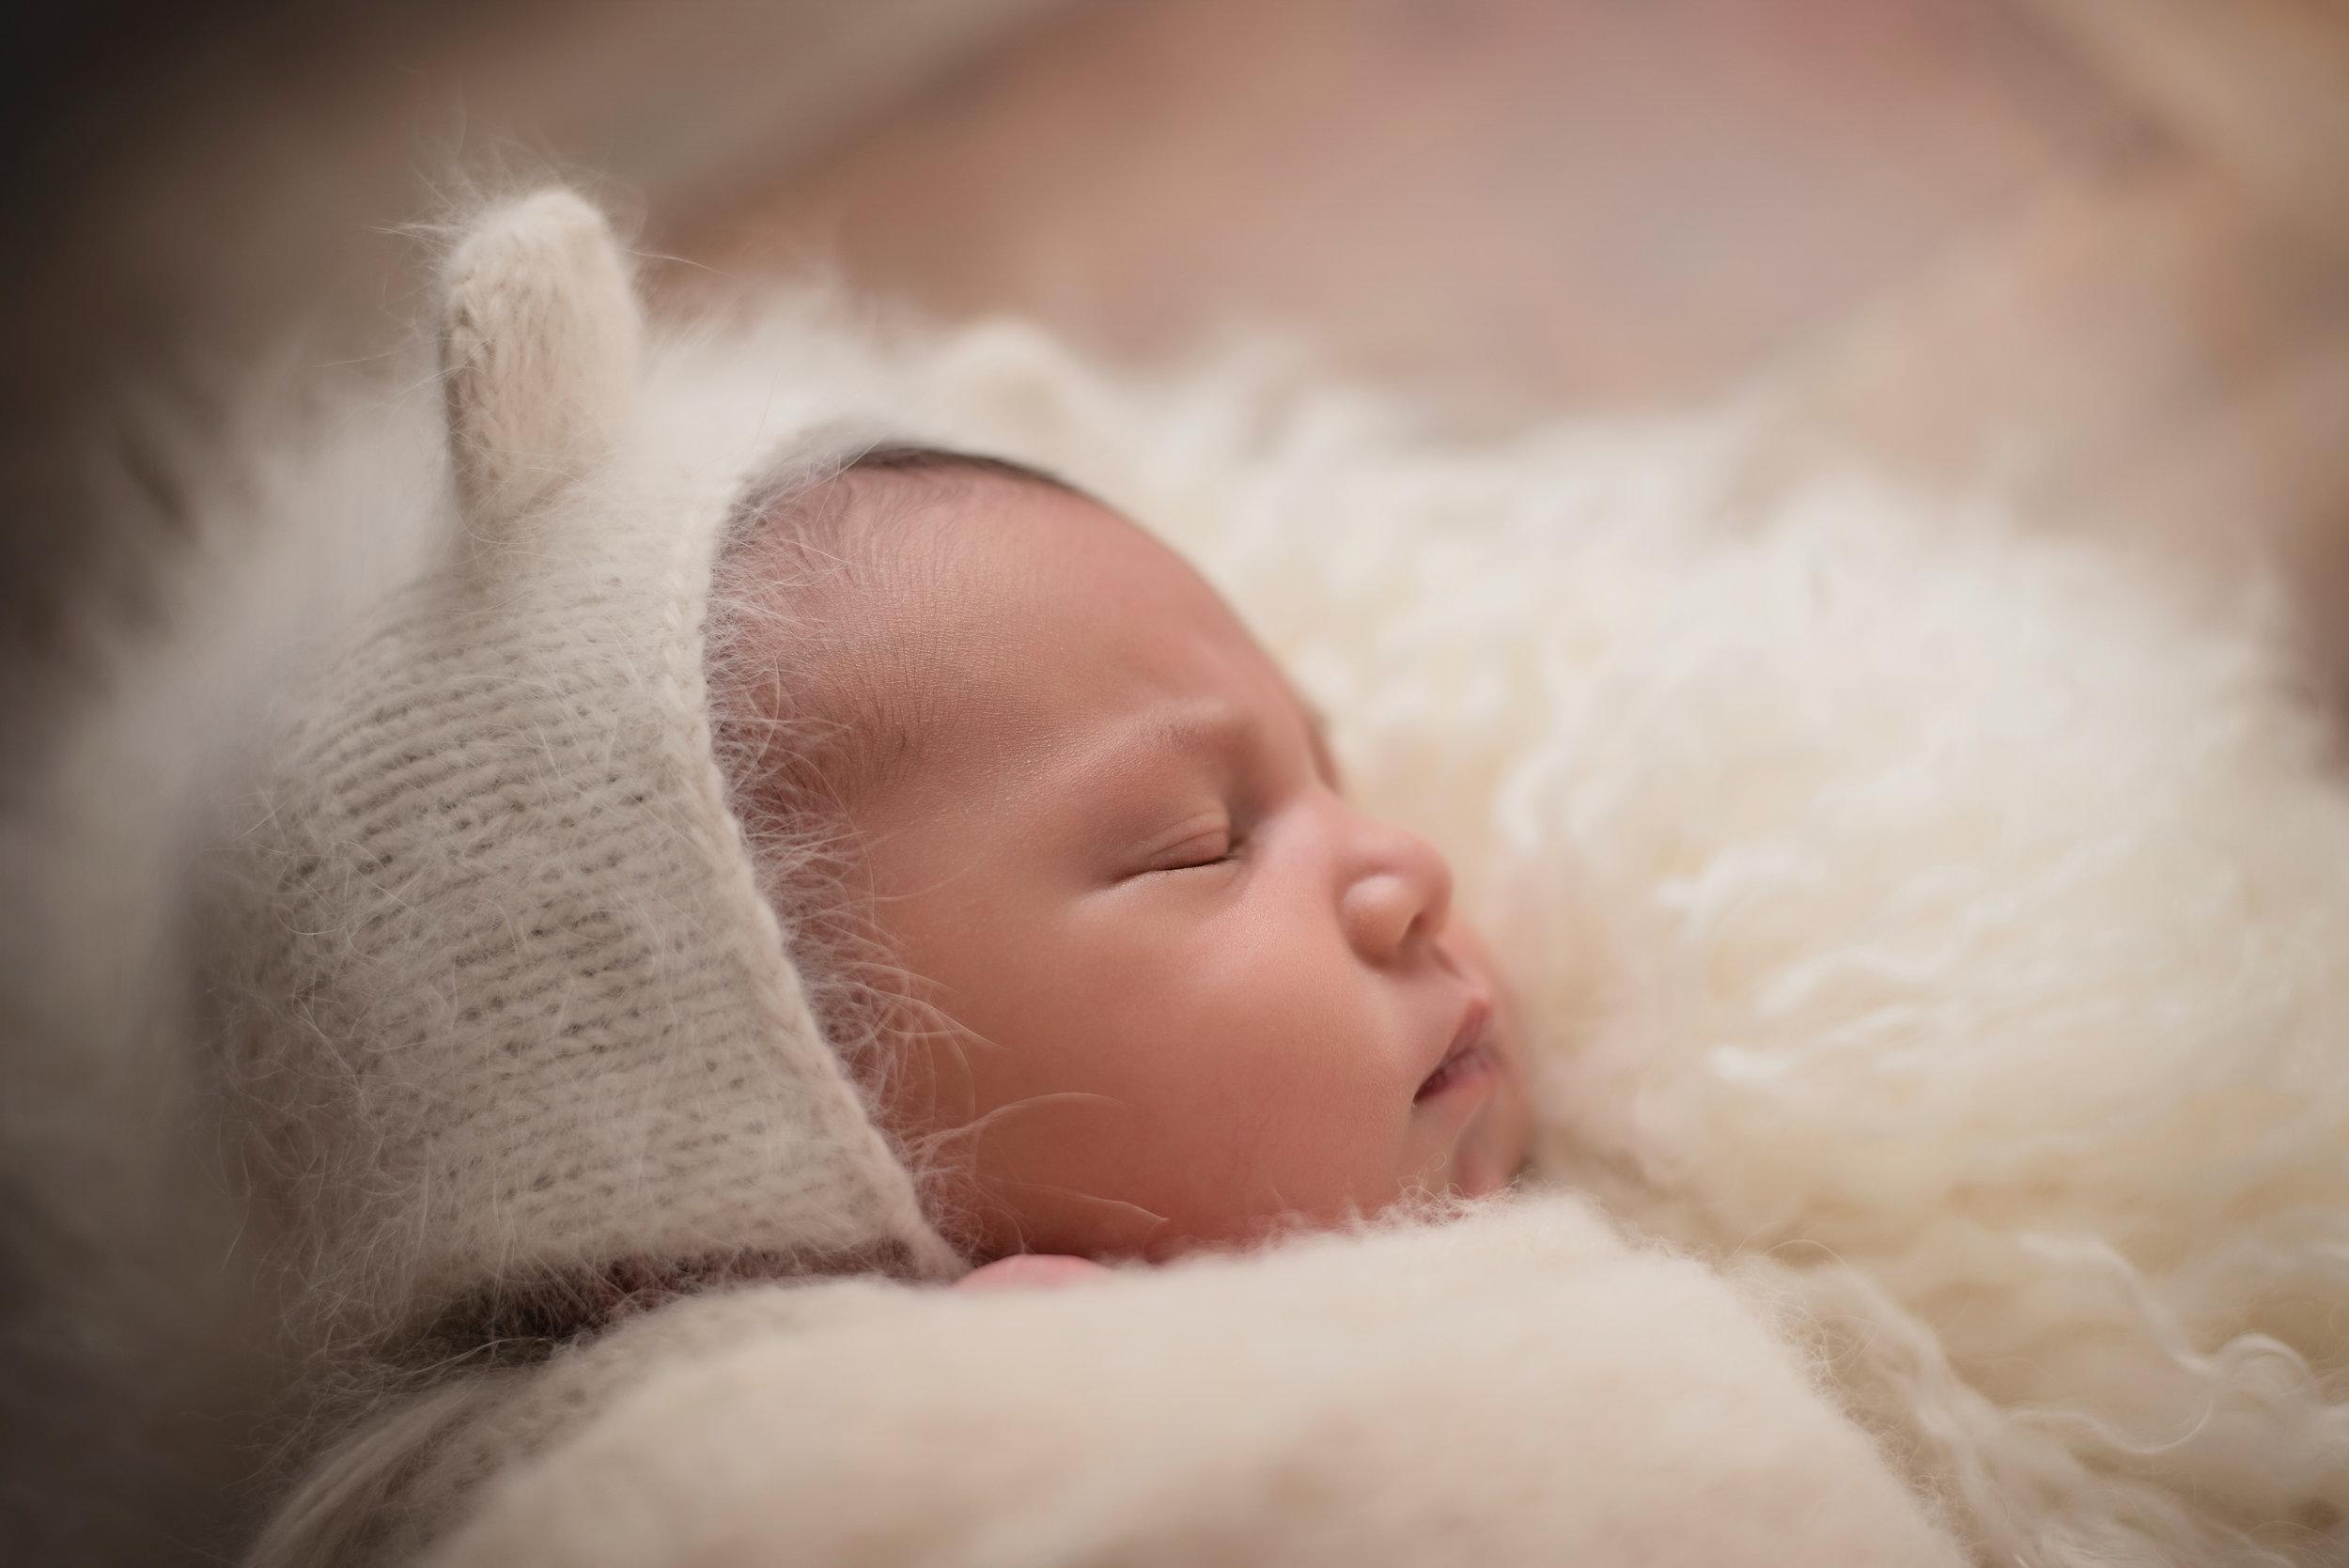 Lonsdale_Newborn_Photographer6.jpg